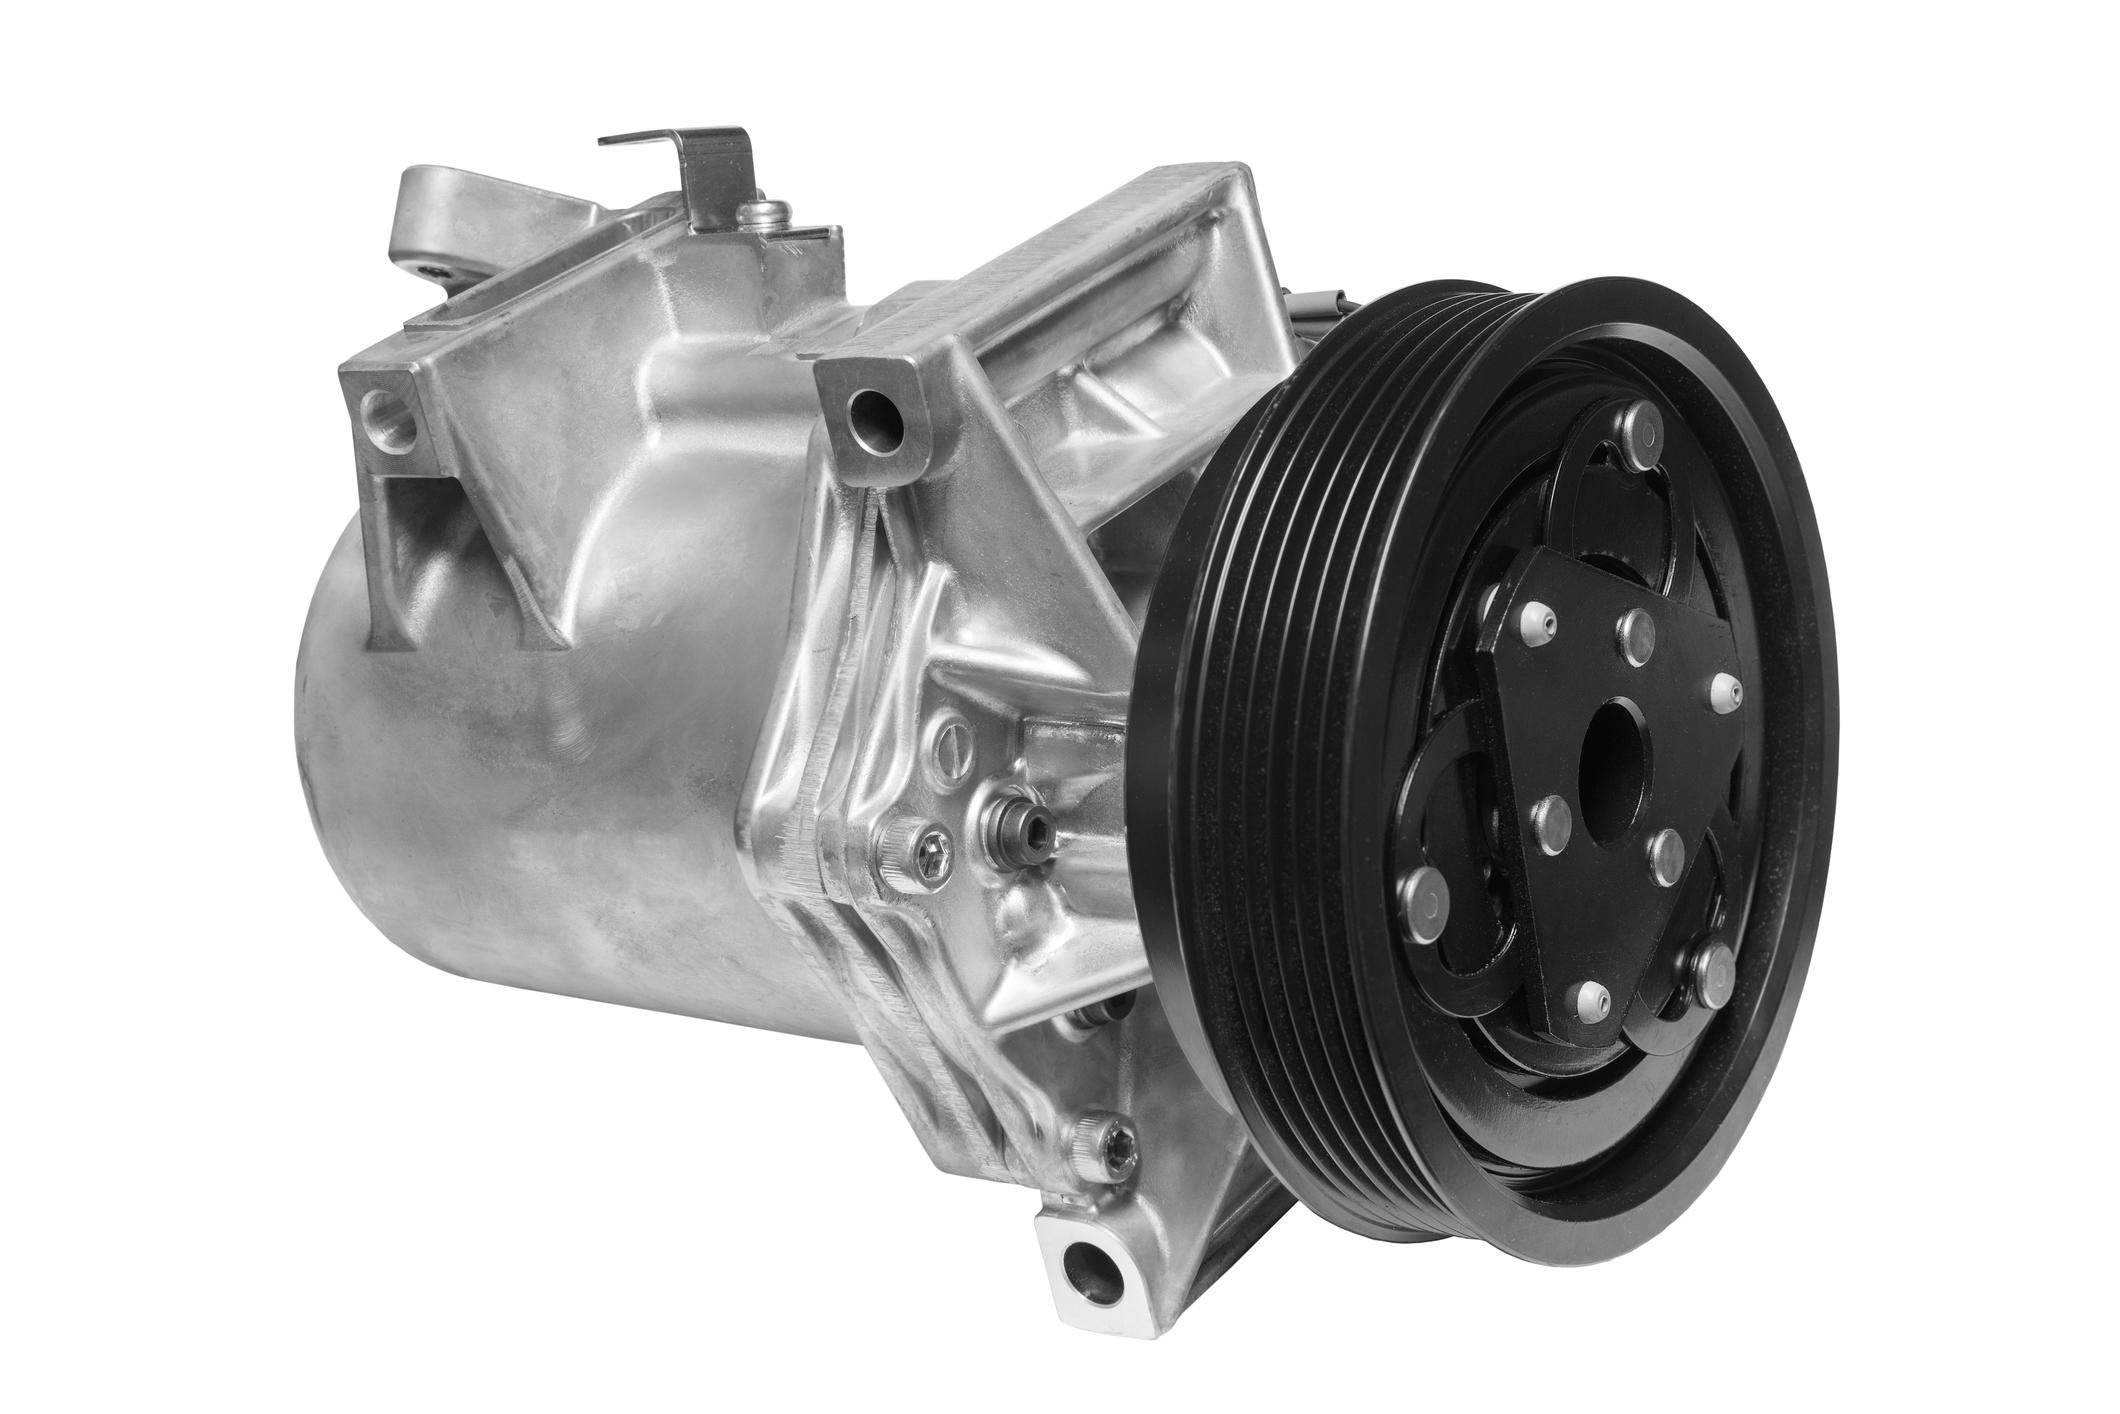 Car Ac Compressor >> Car Ac Compressor Replacement Redangel Products